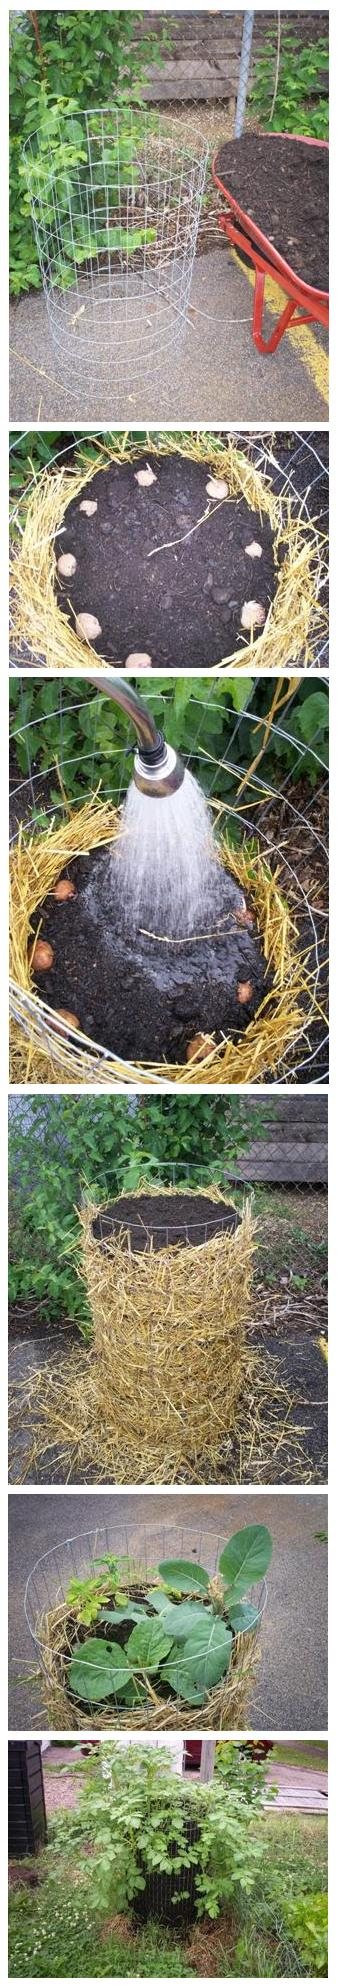 Make your own potato tower